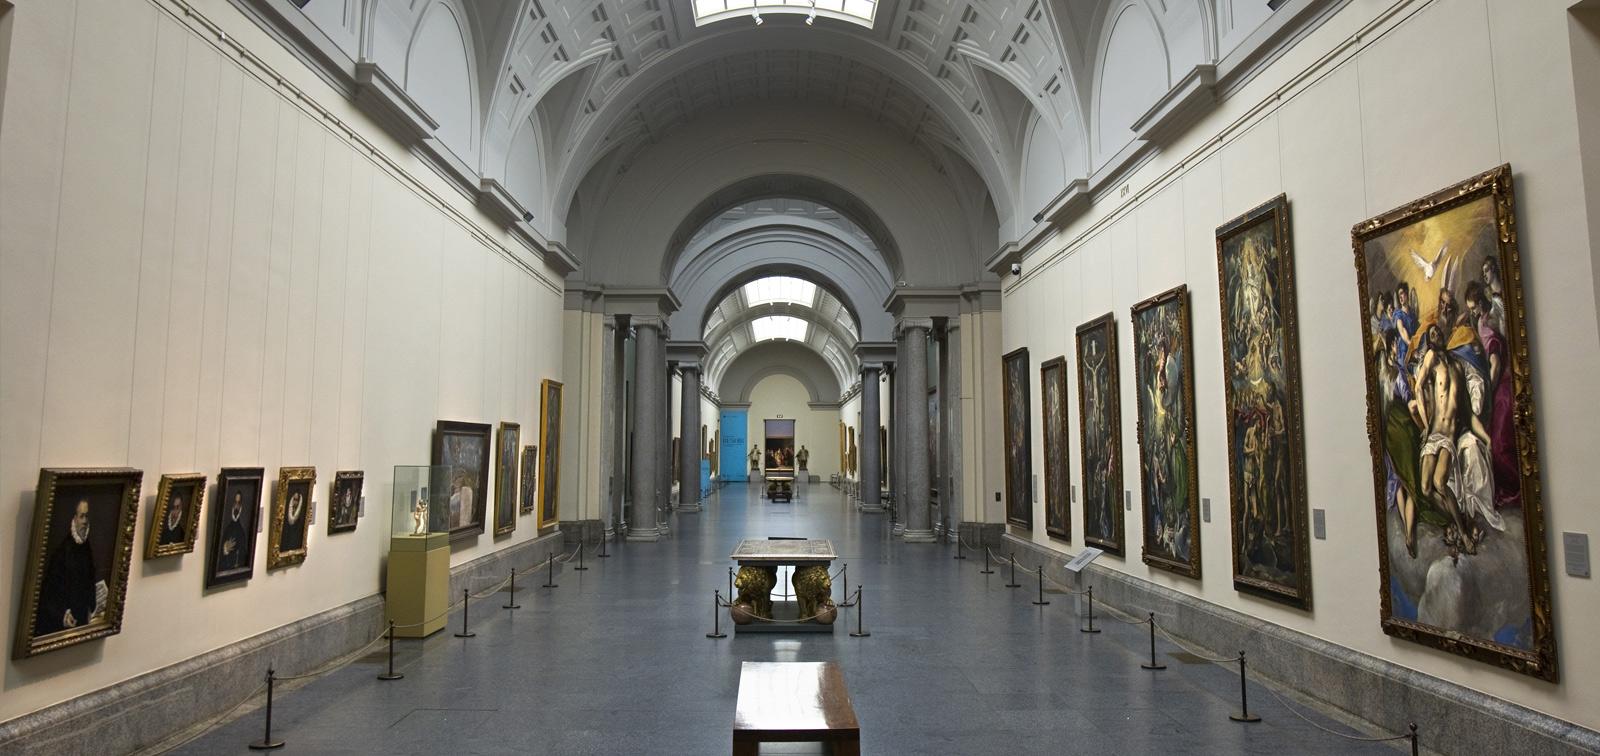 Becas 2018 Fundación Gondra Barandiarán-Museo del Prado para investigadores